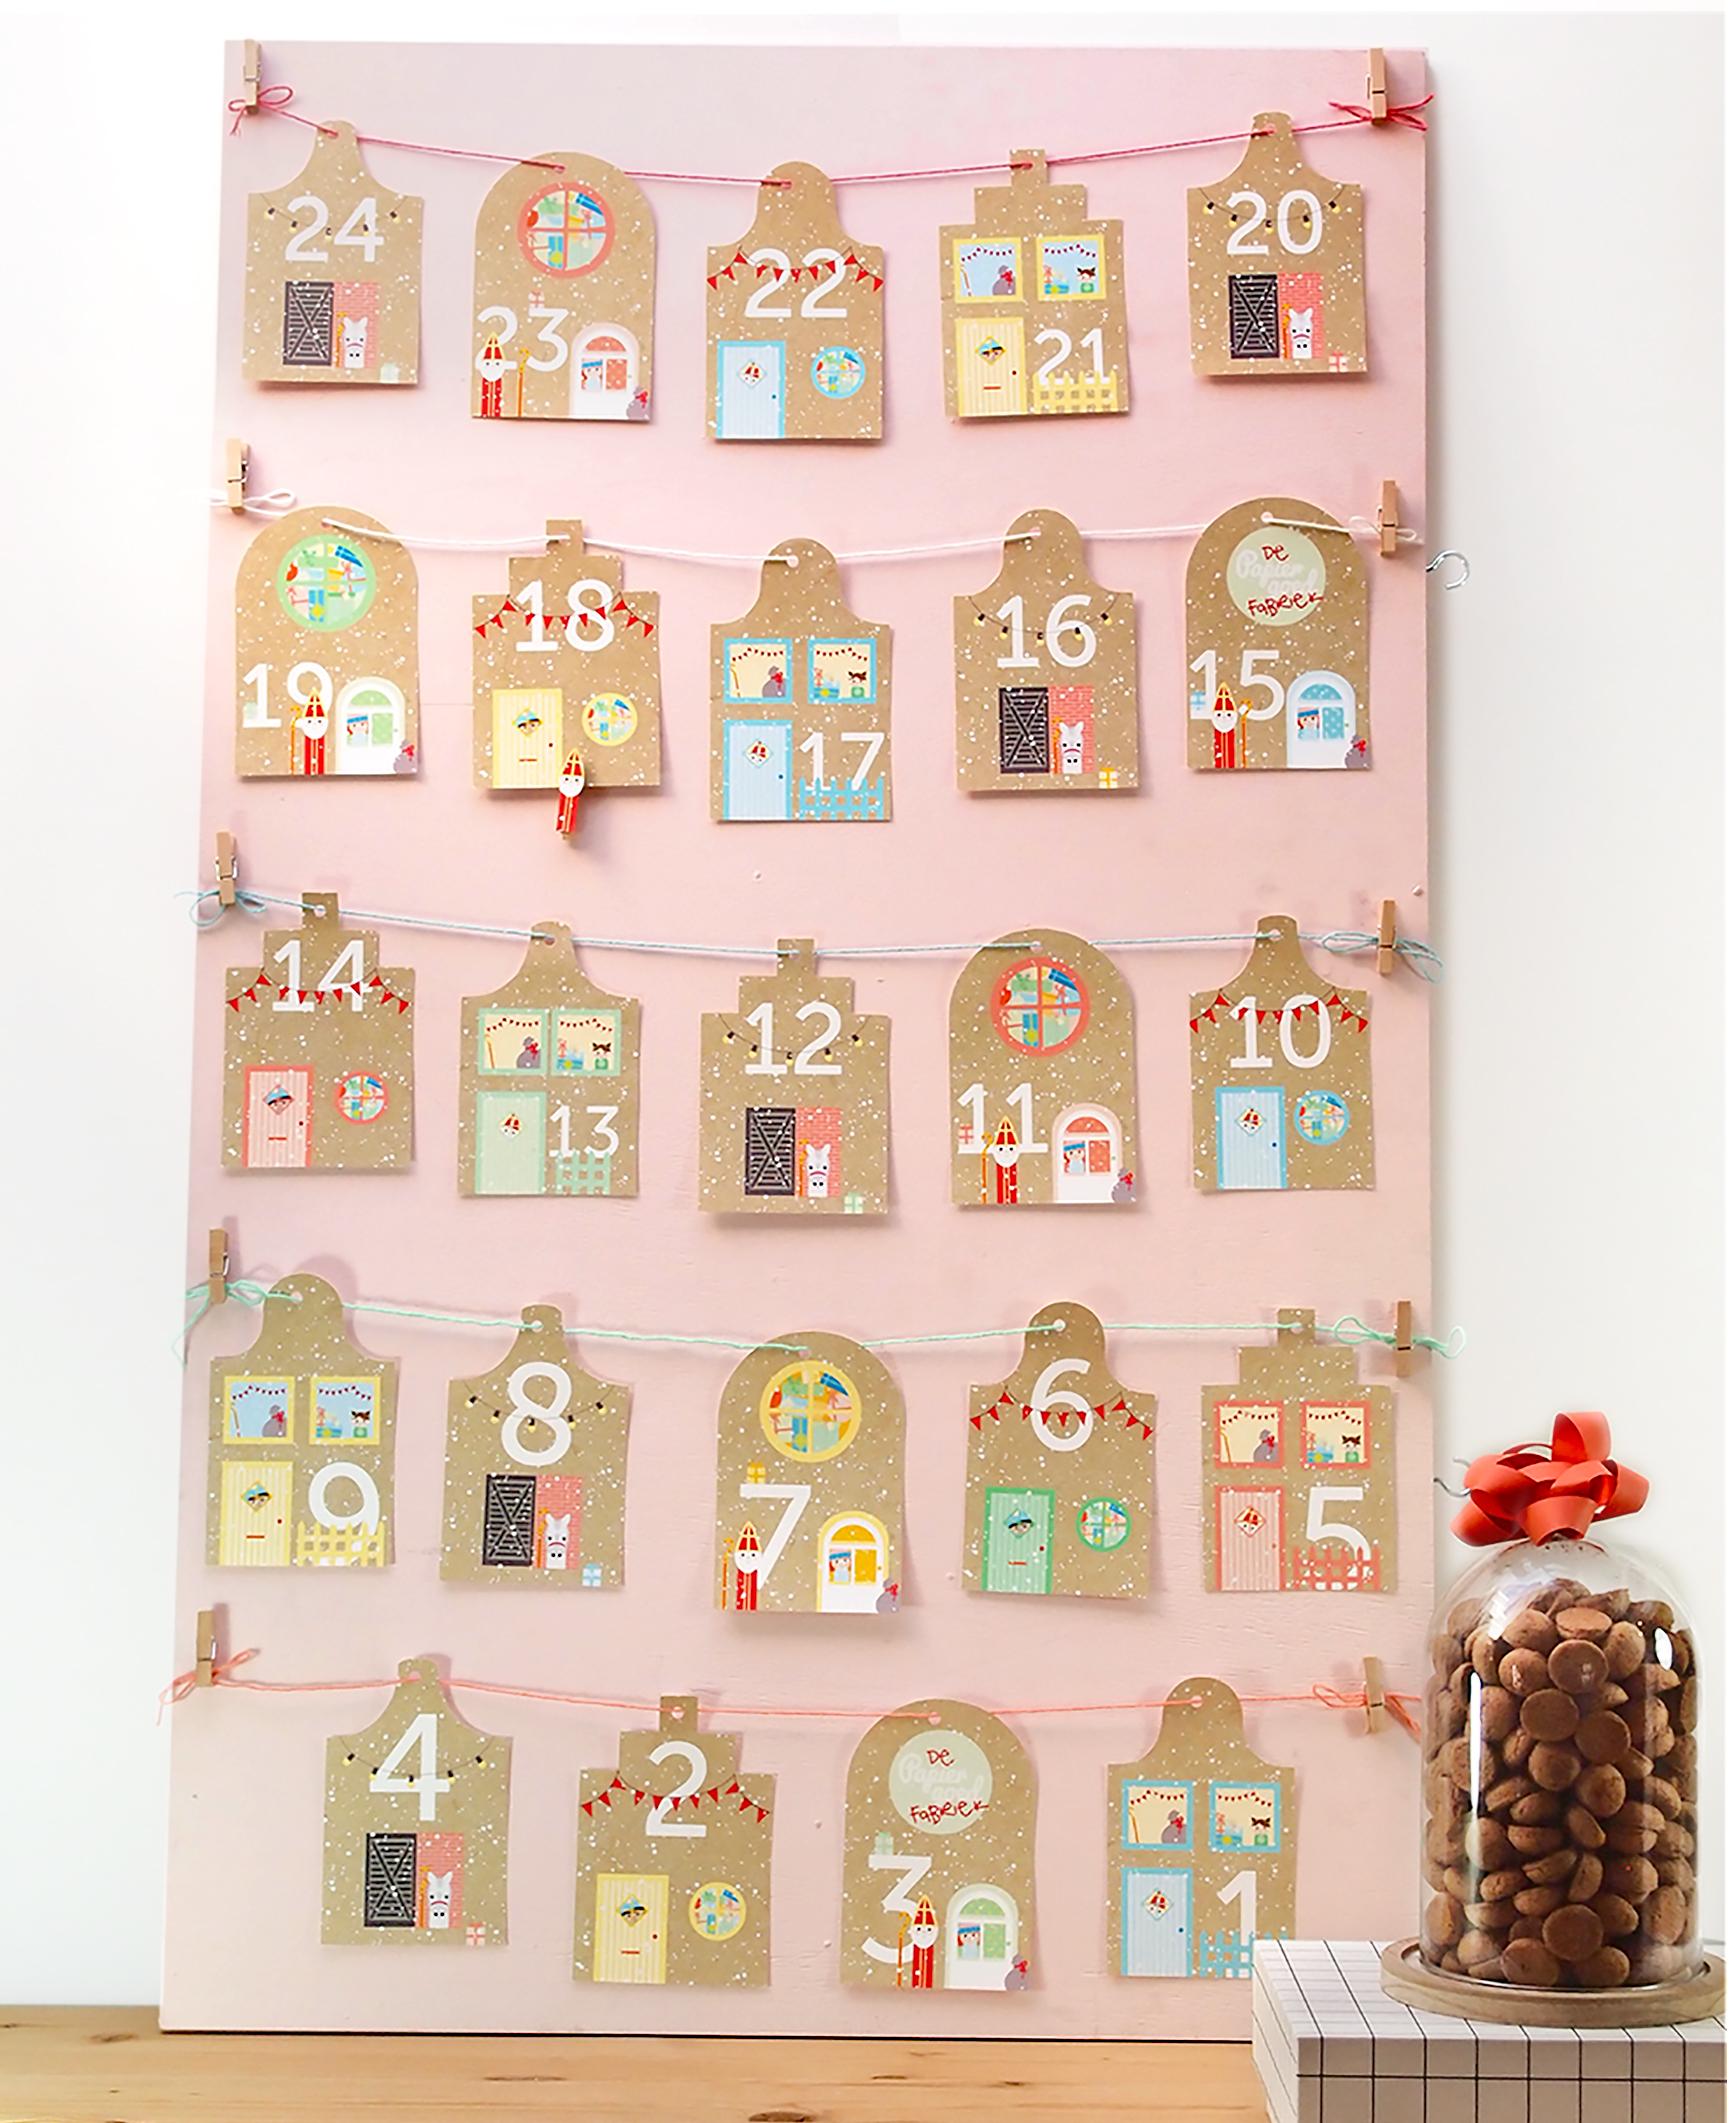 Aftelkalender Sinterklaas pakjesavond